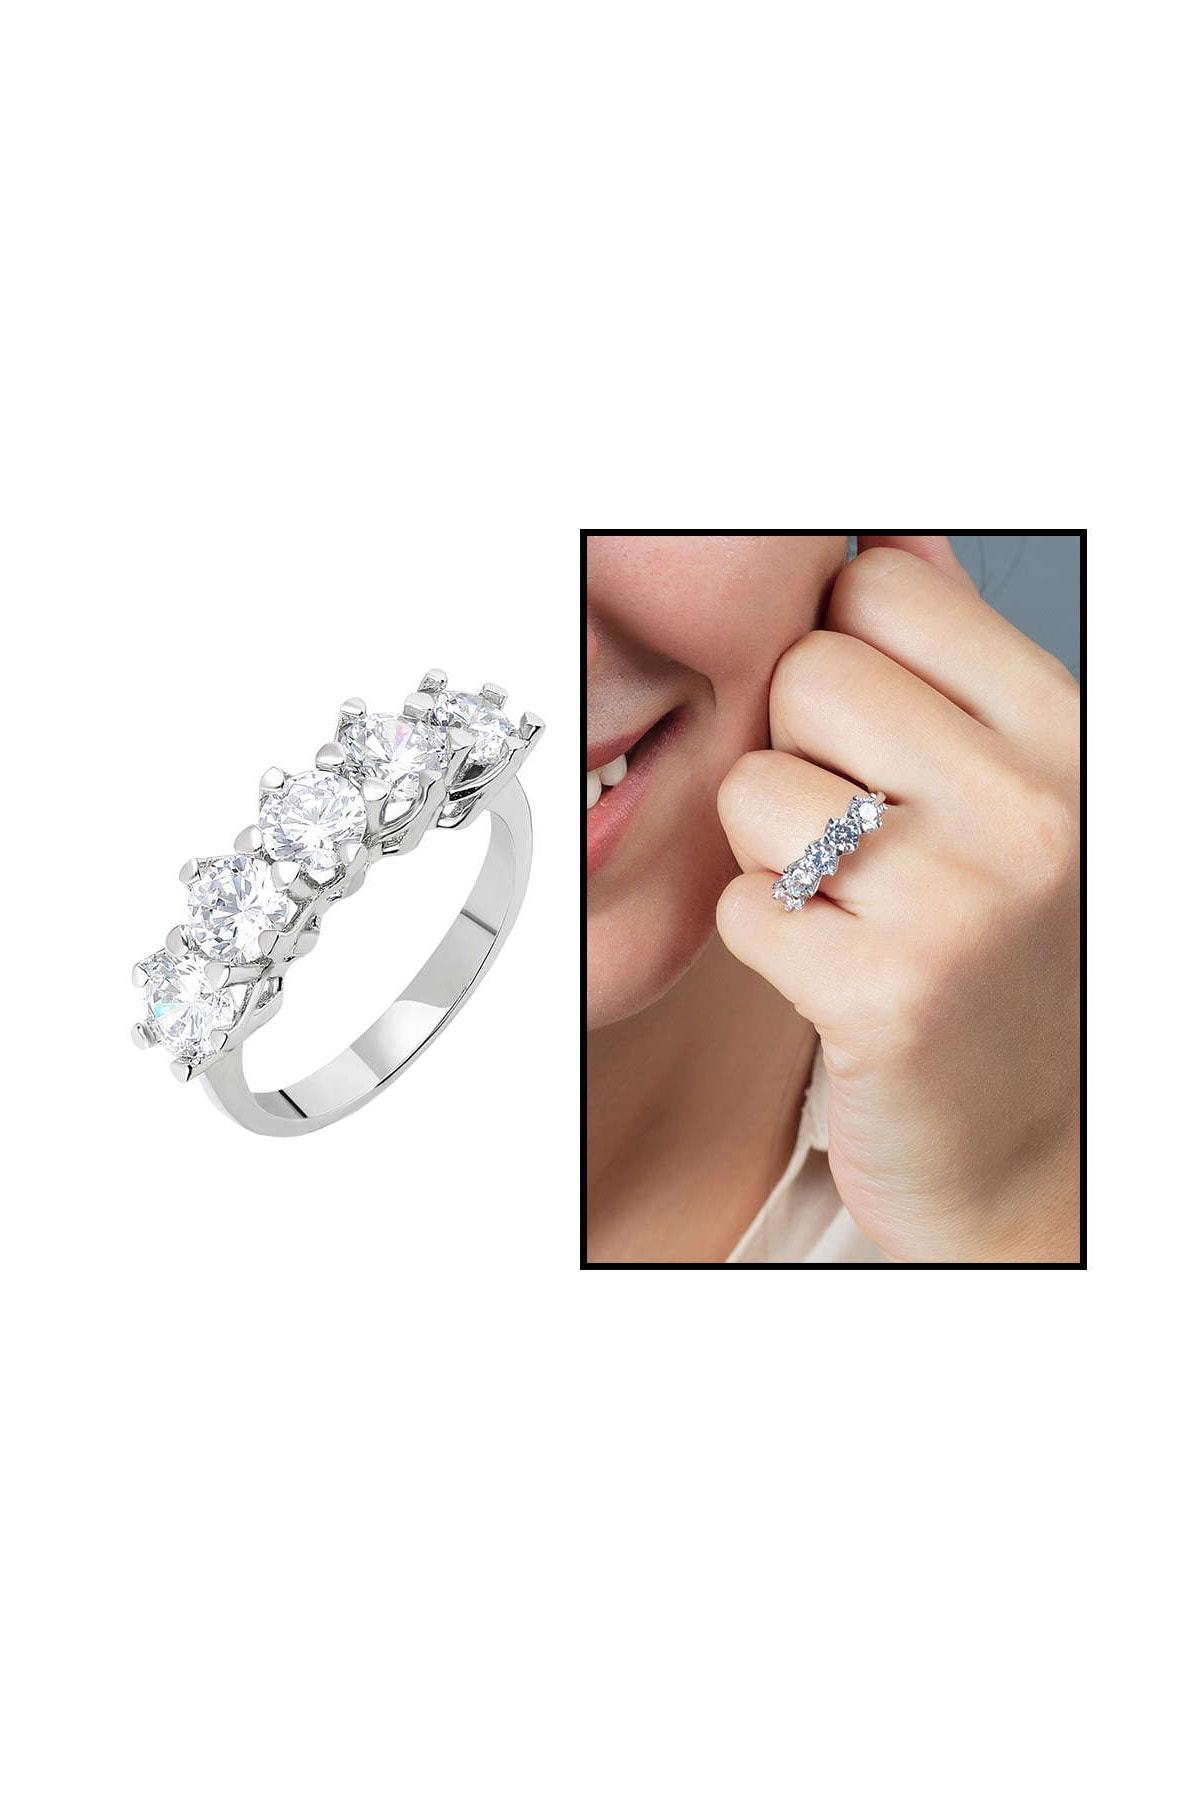 Tesbihane Starlight Diamond Pırlanta Montür 925 Ayar Gümüş Bayan Beştaş Yüzük 102001816 1